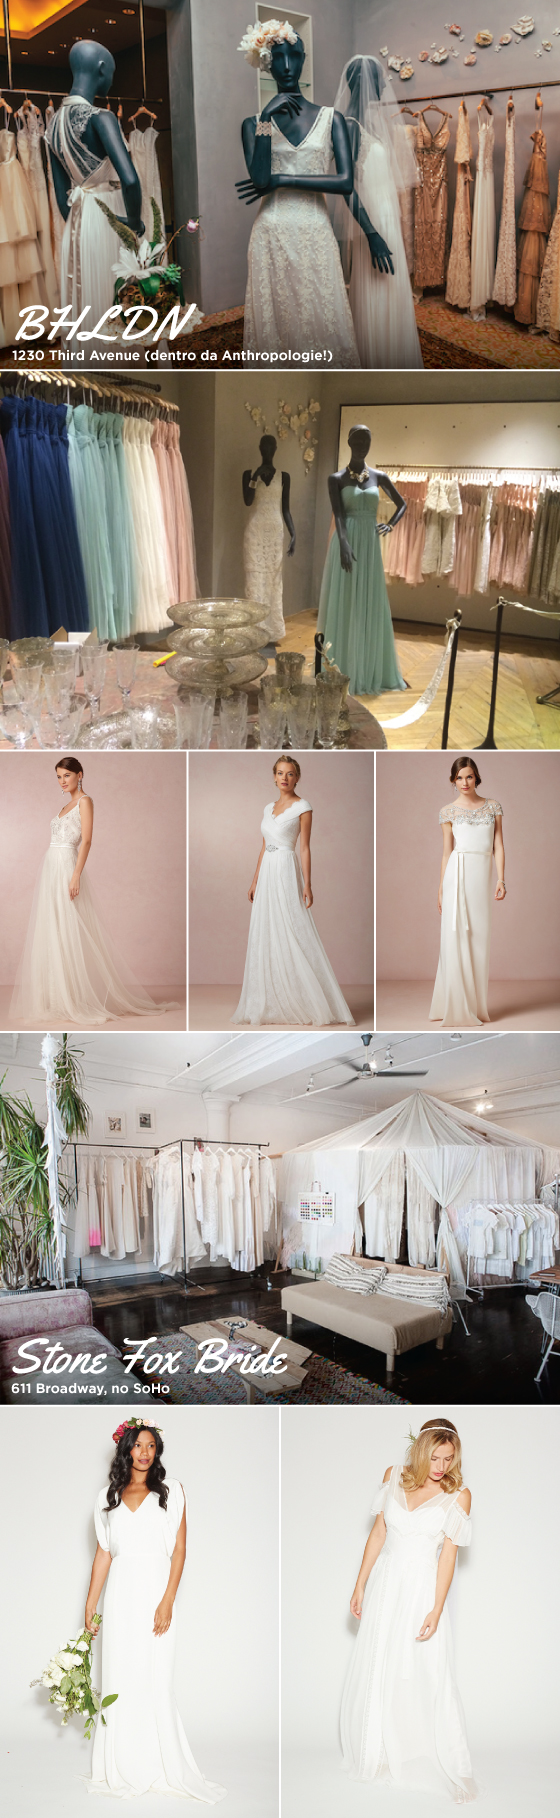 onde-comprar-vestido-noiva-wedding-bridal-gown-dress-noiva-dica-viagem-ny-nyc-indie-alternativo-diferente-bride-bridal-bhldn-stone-fox